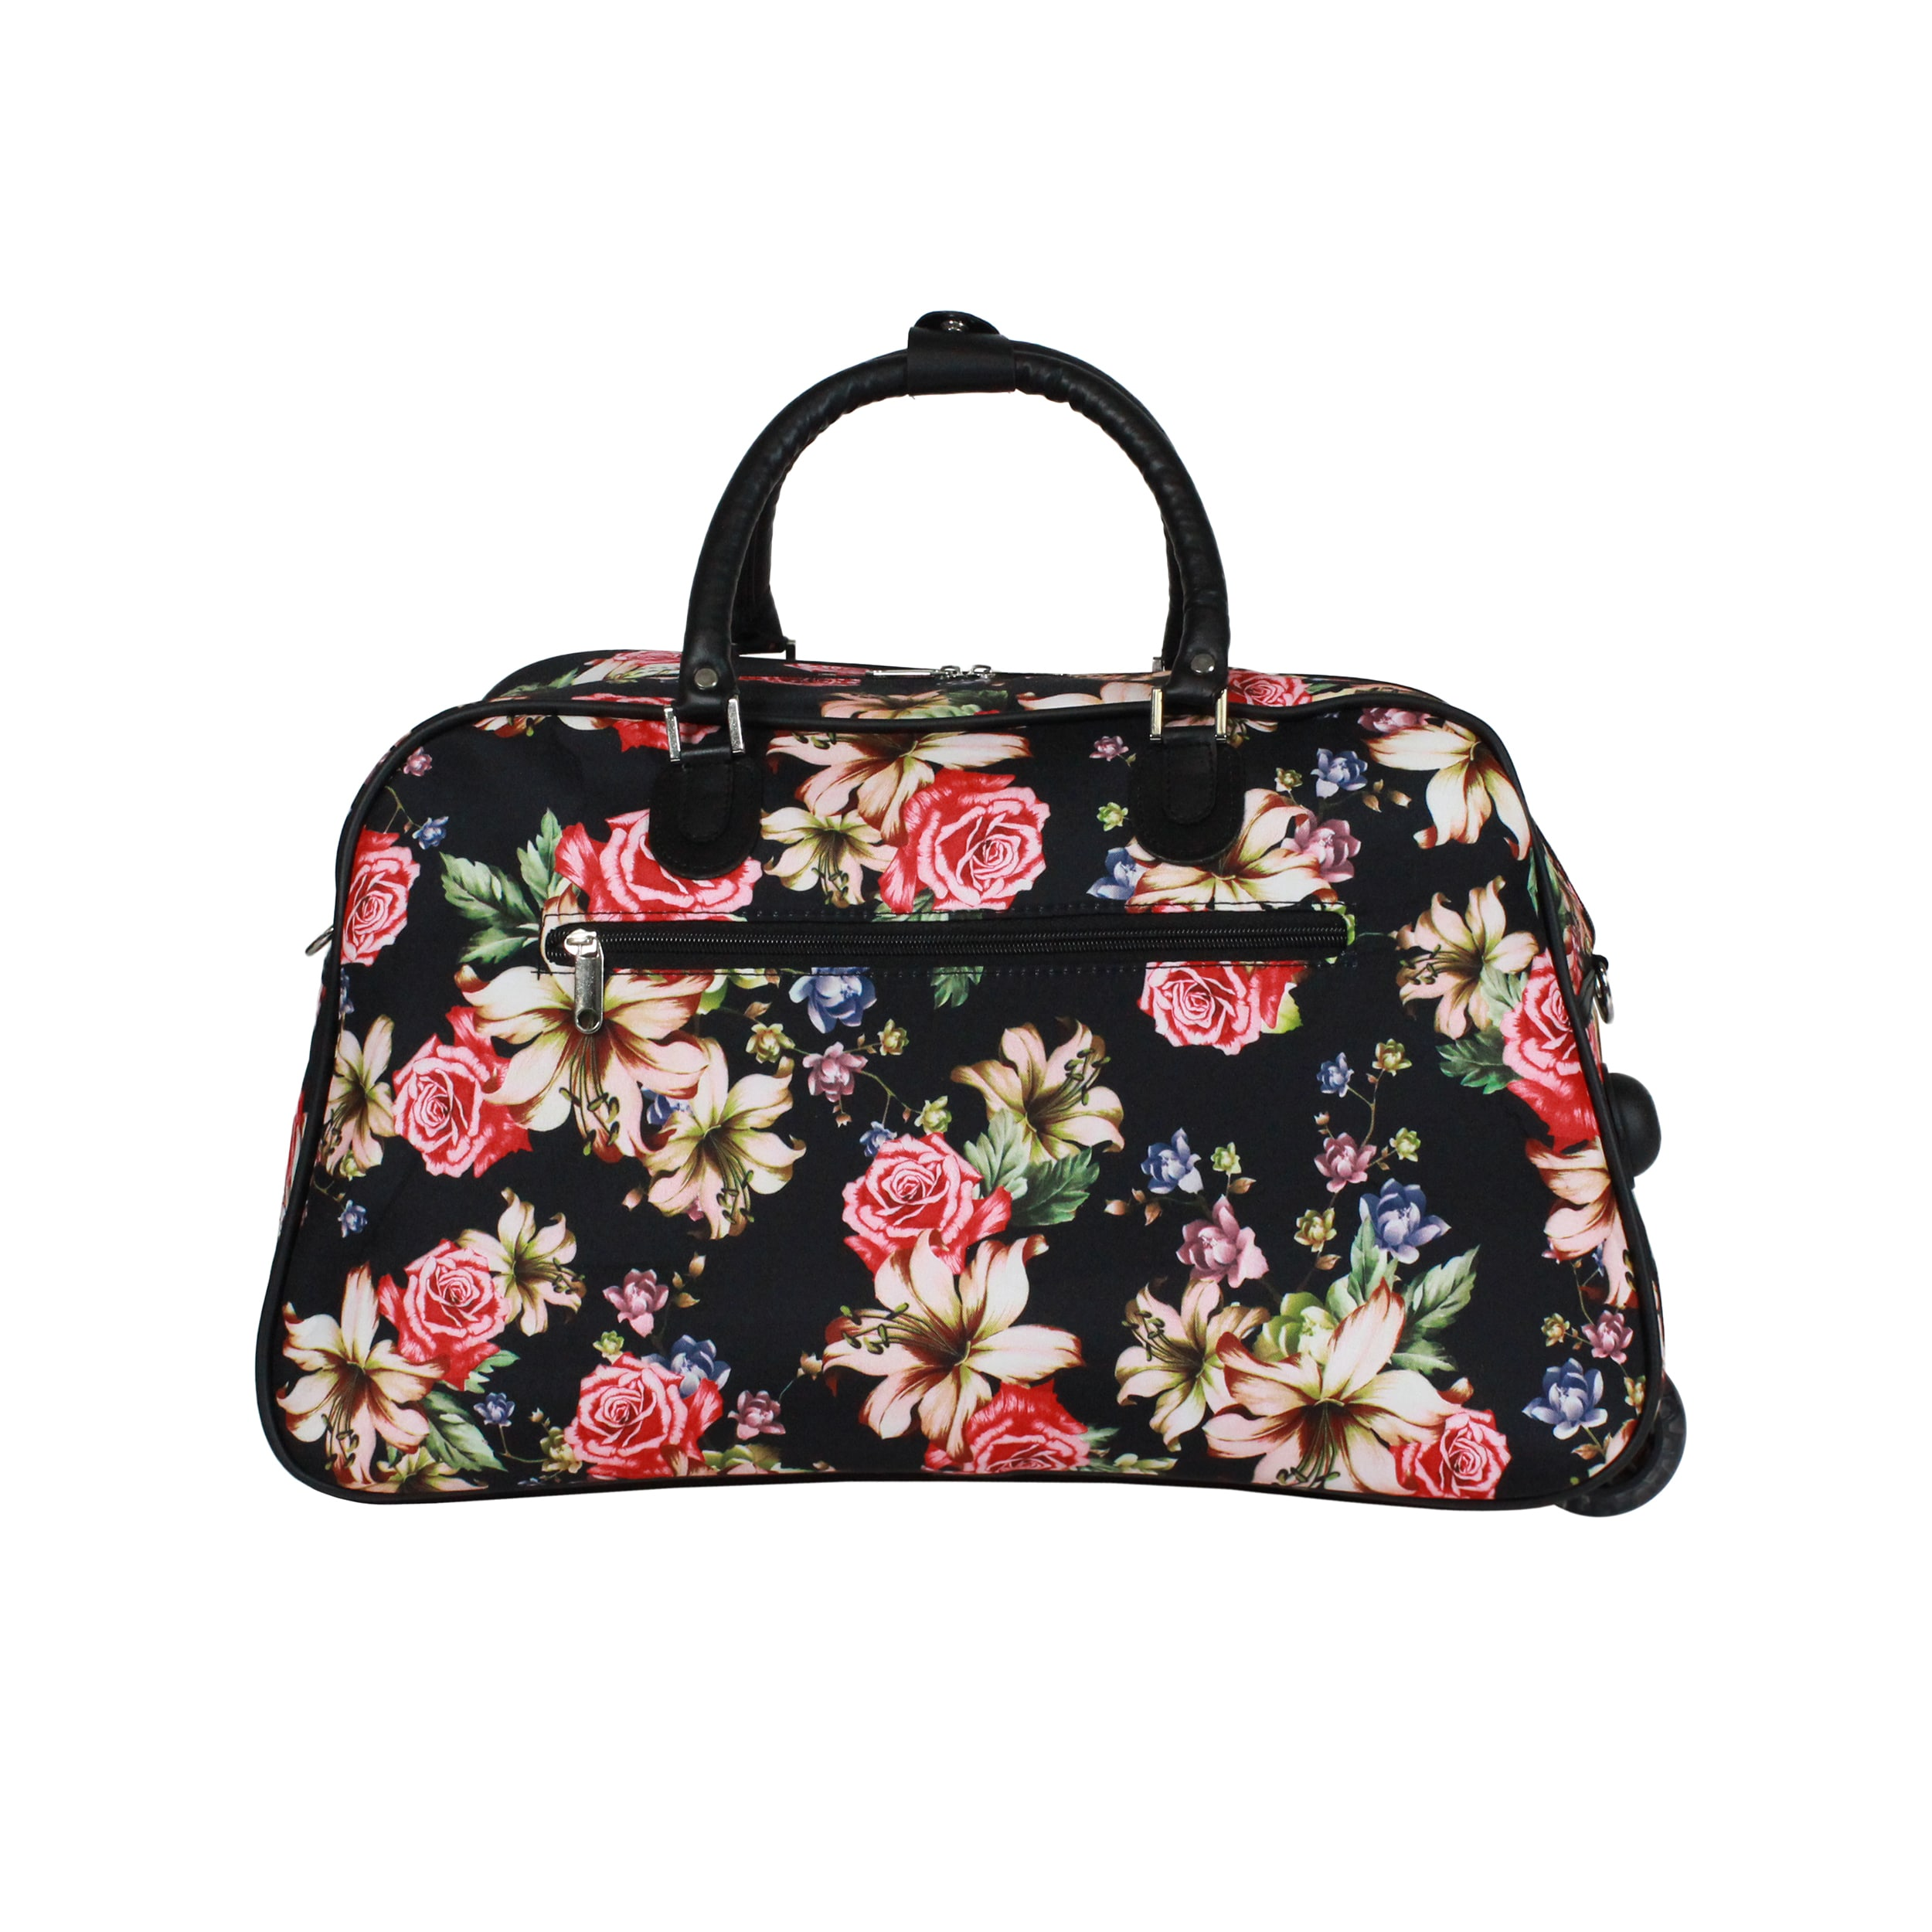 Shop World Traveler Flower Bloom 21-Inch Carry-On Rolling Duffel Bag ... 0cf9ae0289